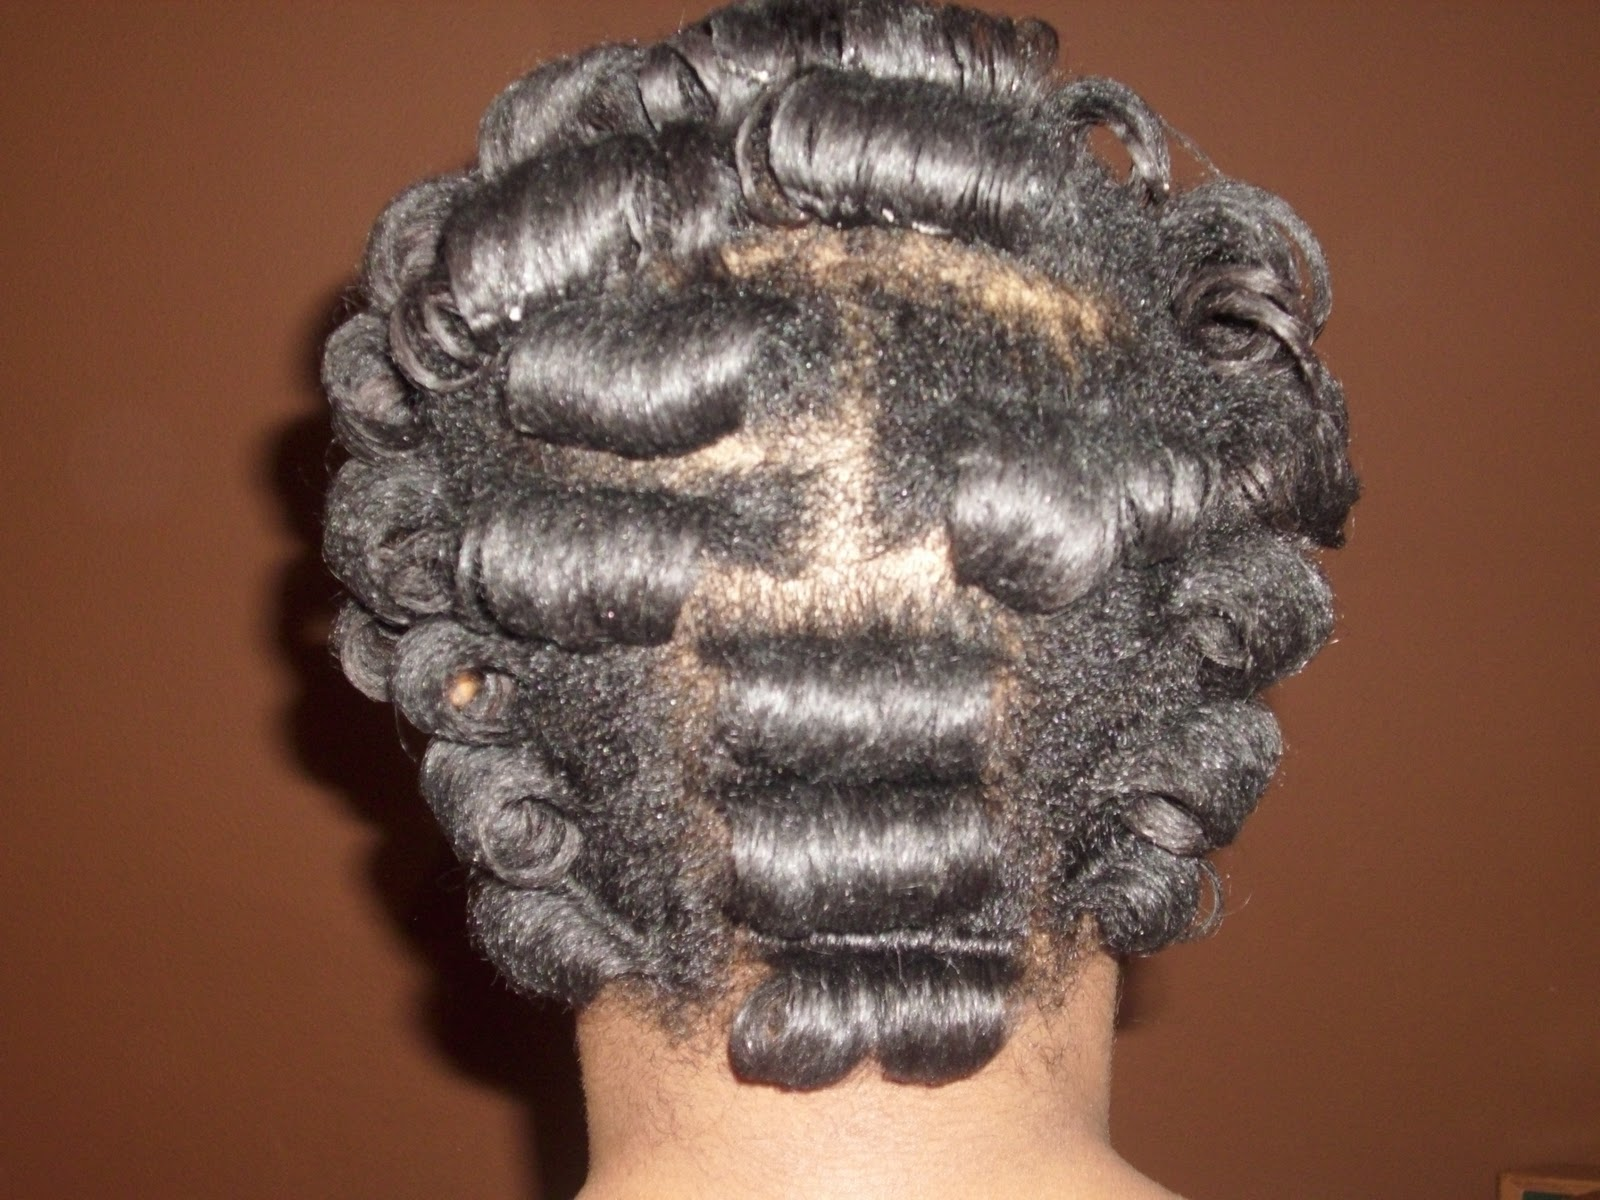 Black Hair Roller Set Styles: My Natural Hair Journey: Roller Set 11-20-11